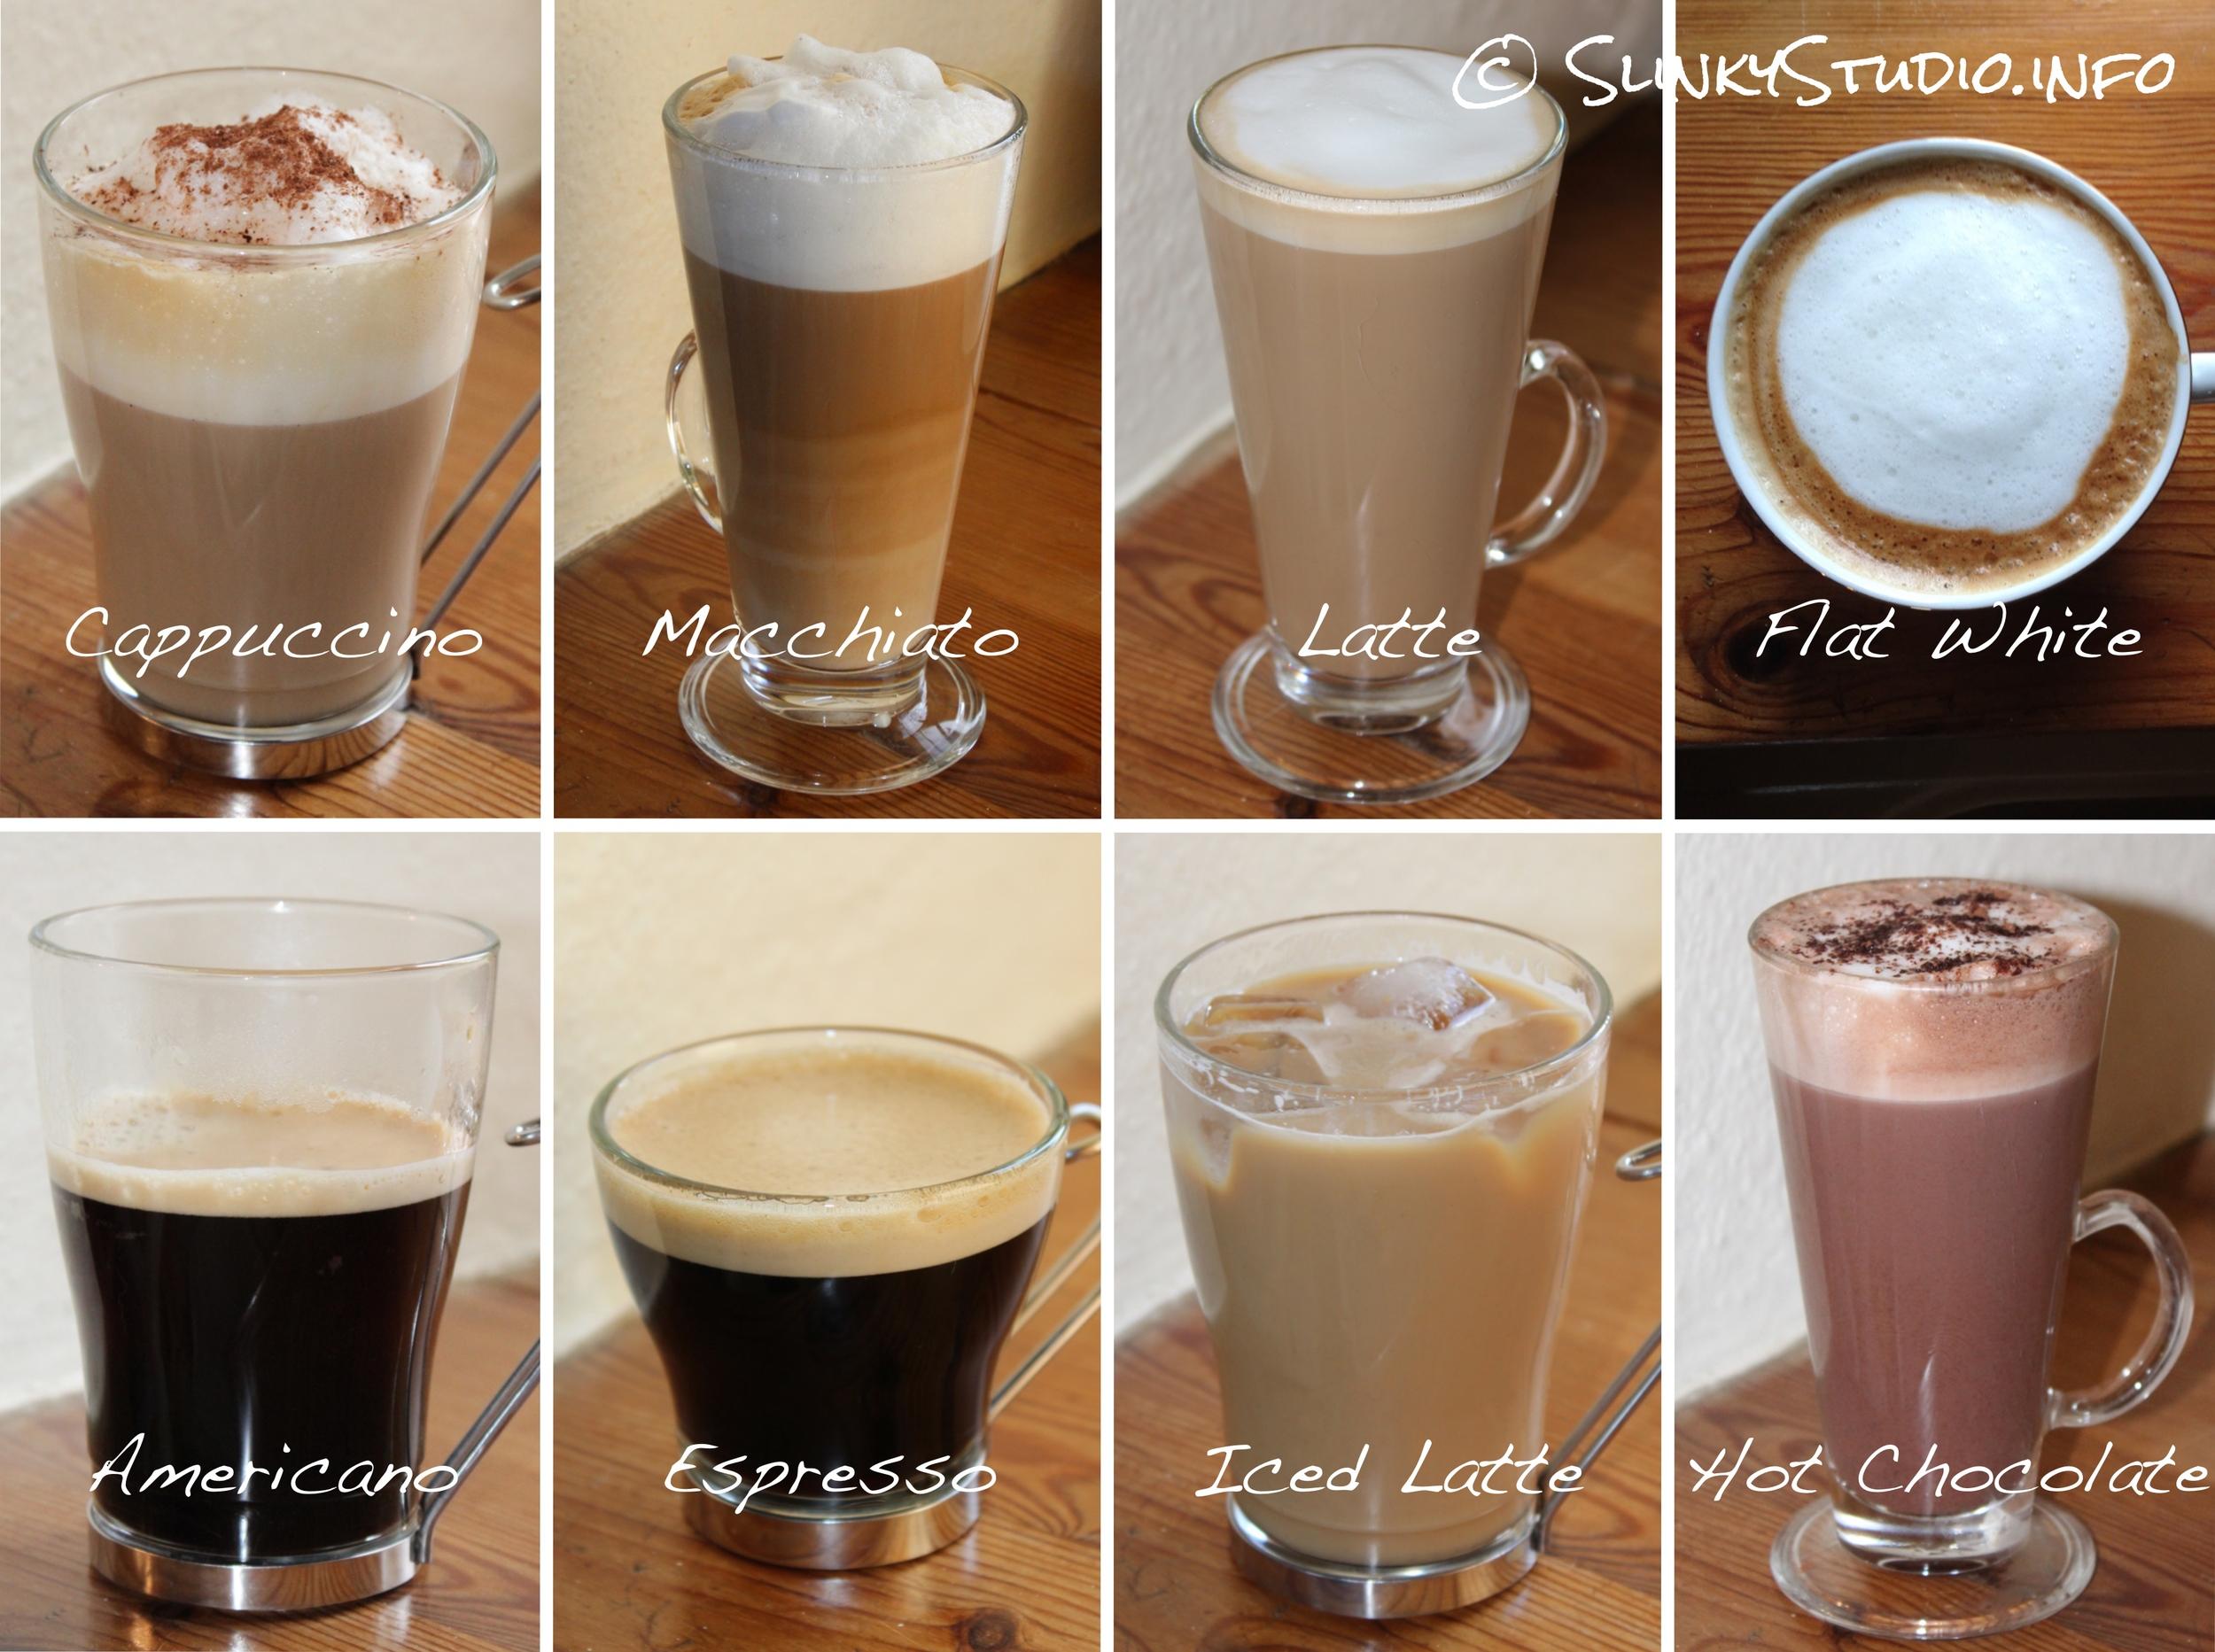 Sage+Barista+Express+Cappuccino,+Latte,+Flat+White,+Americano,+Espresso,+Iced+Latte,+Hot+Chocolate,+Macchiato Best Coffee Maker For Lattes